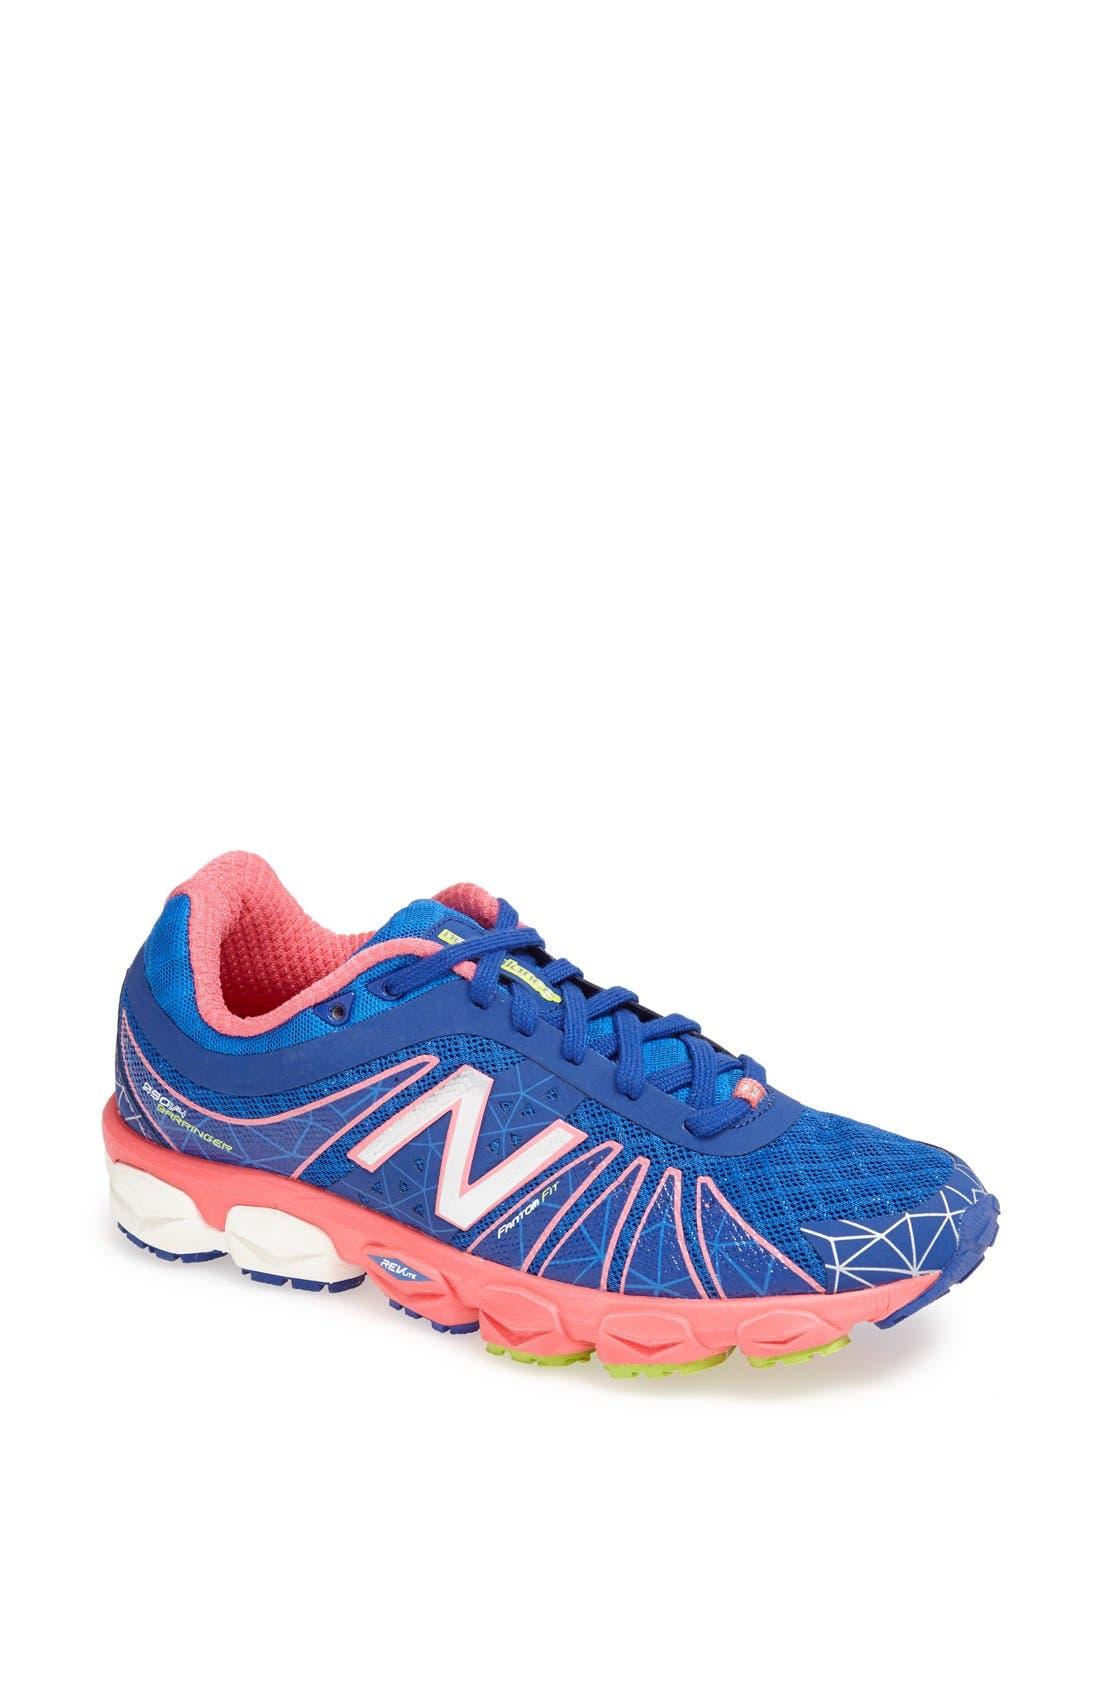 Alternate Image 1 Selected - New Balance '890' Running Shoe (Women)